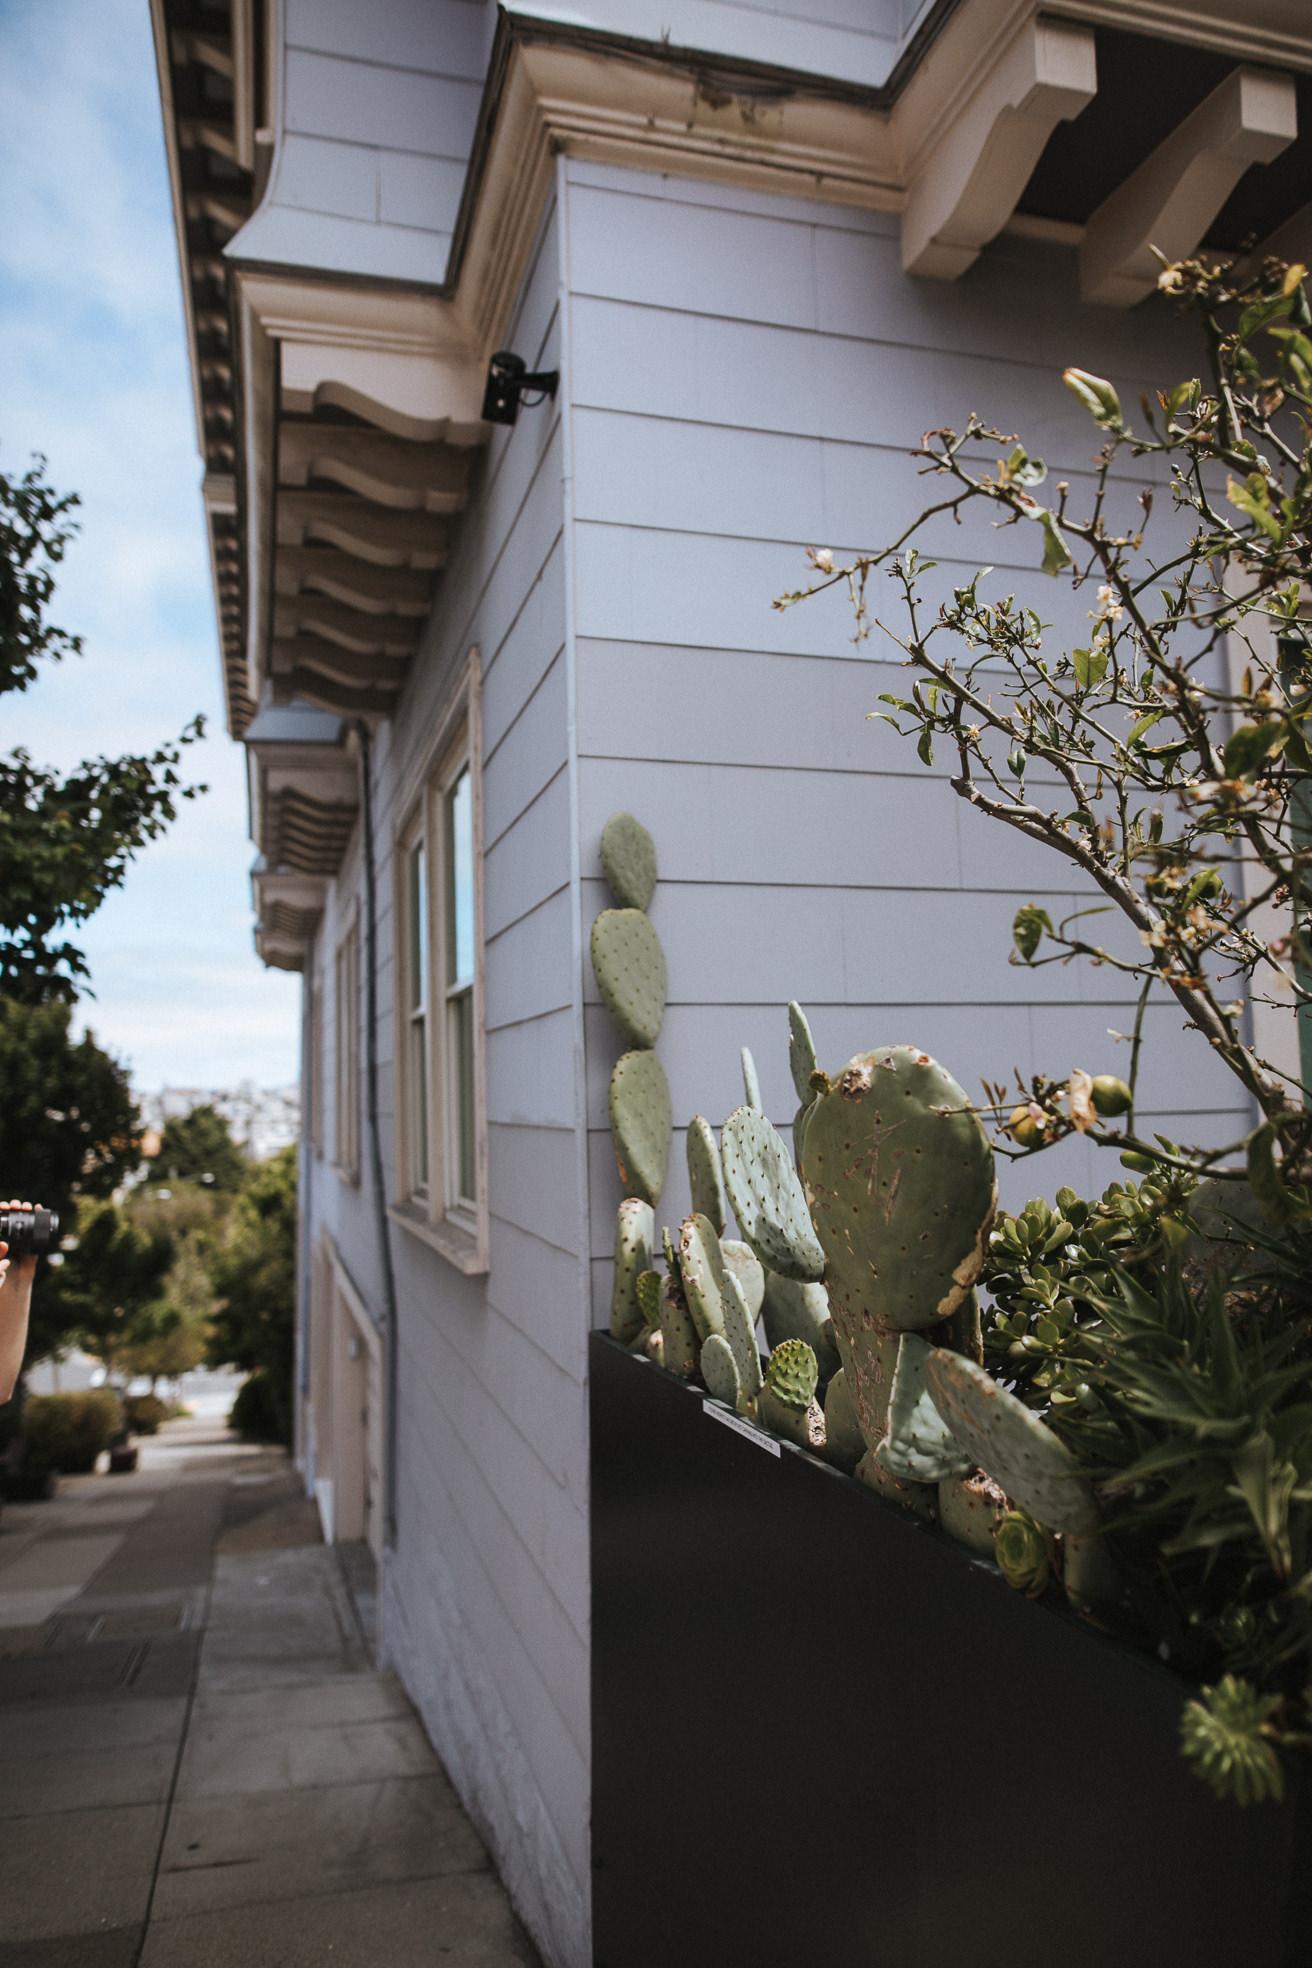 San-Francisco-BildervomLeben-4937